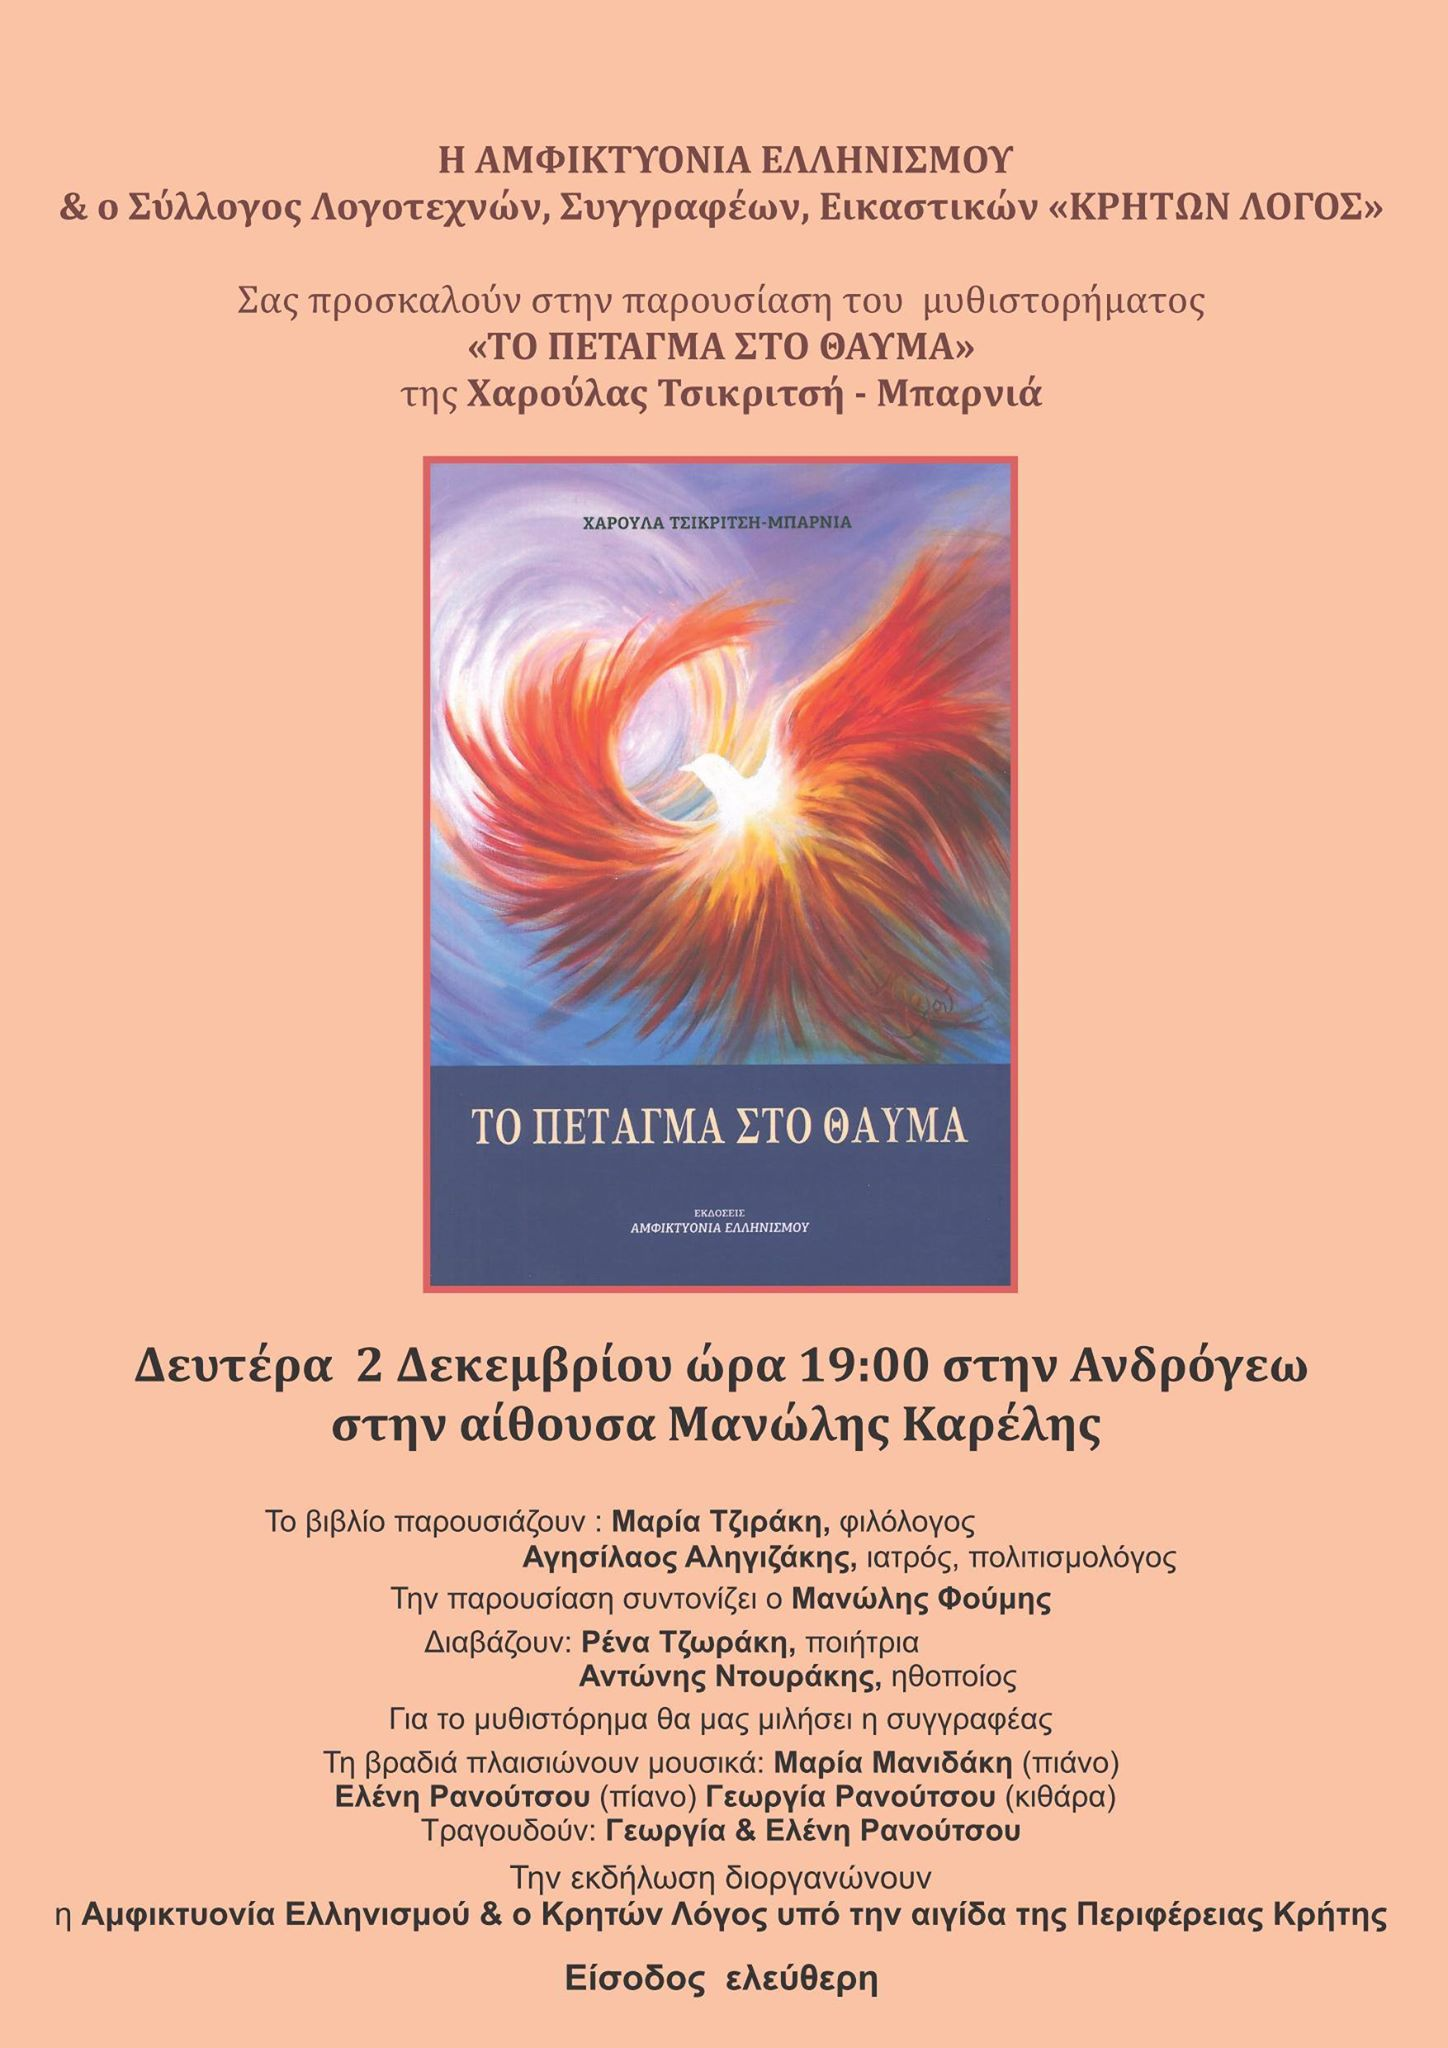 76767393_1153524371703507_7129846823203635200_n Νέο μυθιστόρημα της Χαρούλας Τσικριτζή - Μπαρνιά